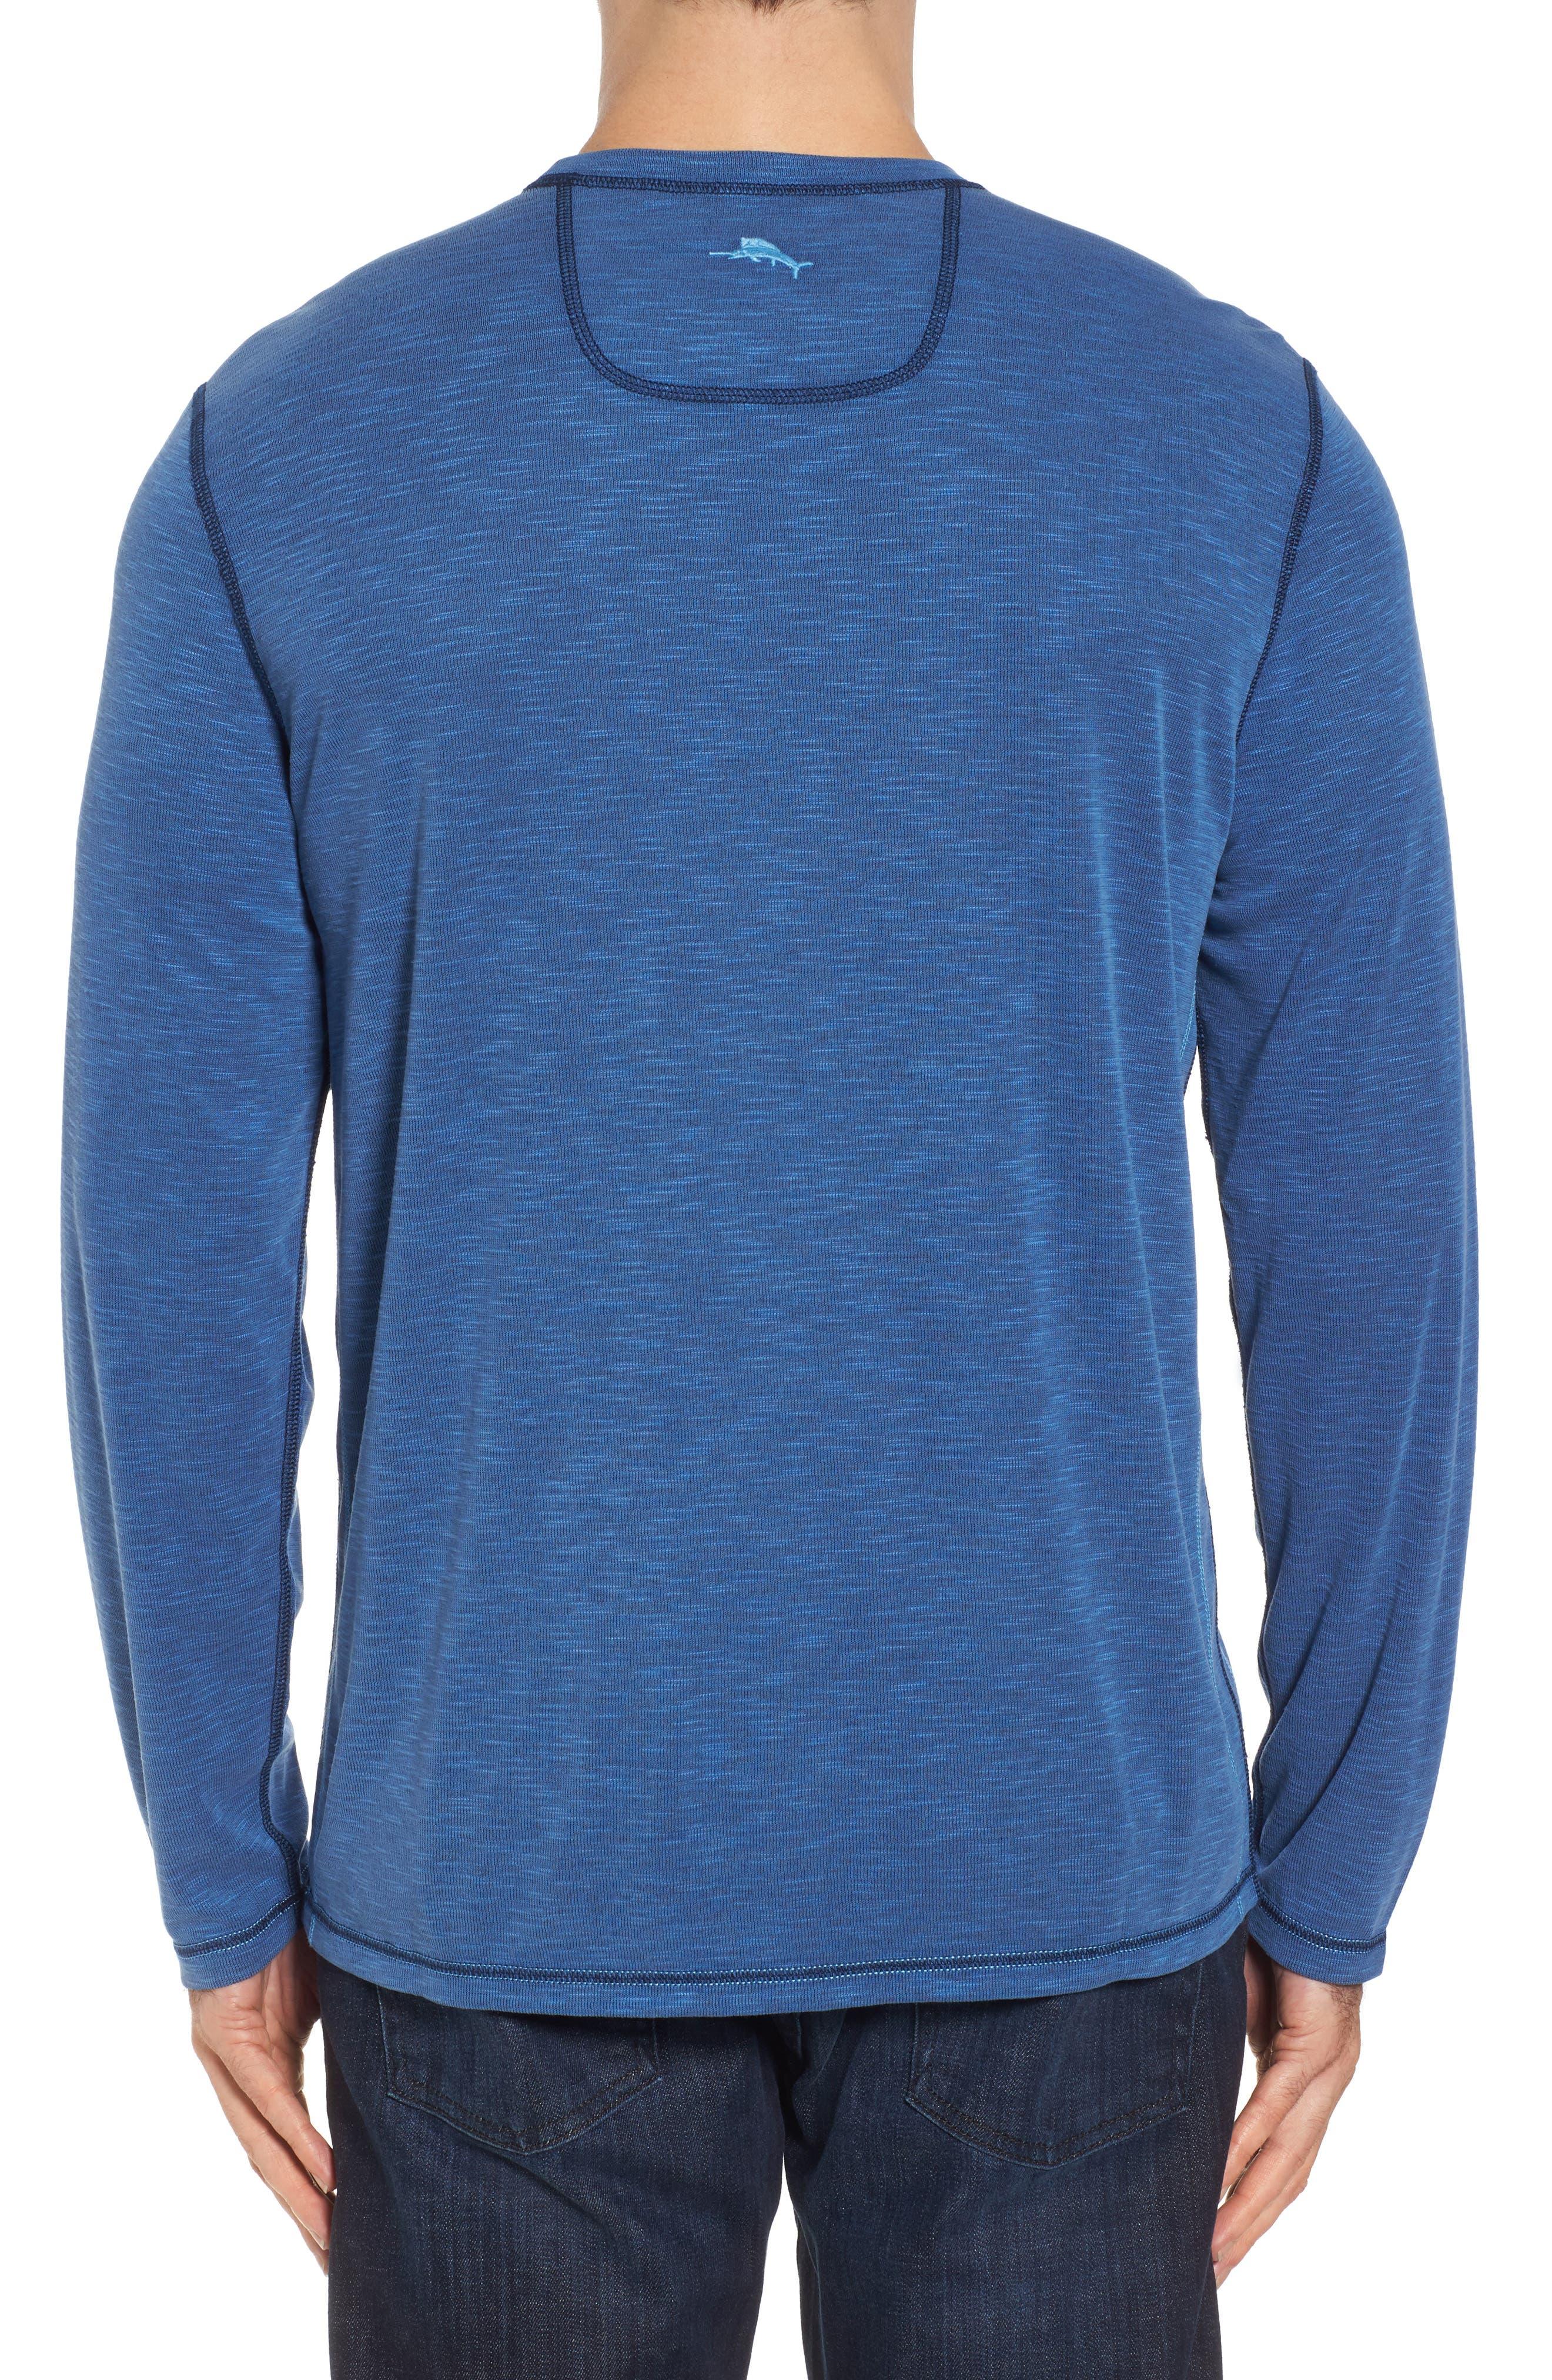 Flip Tide Standard Fit T-Shirt,                             Alternate thumbnail 3, color,                             GALAXY BLUE